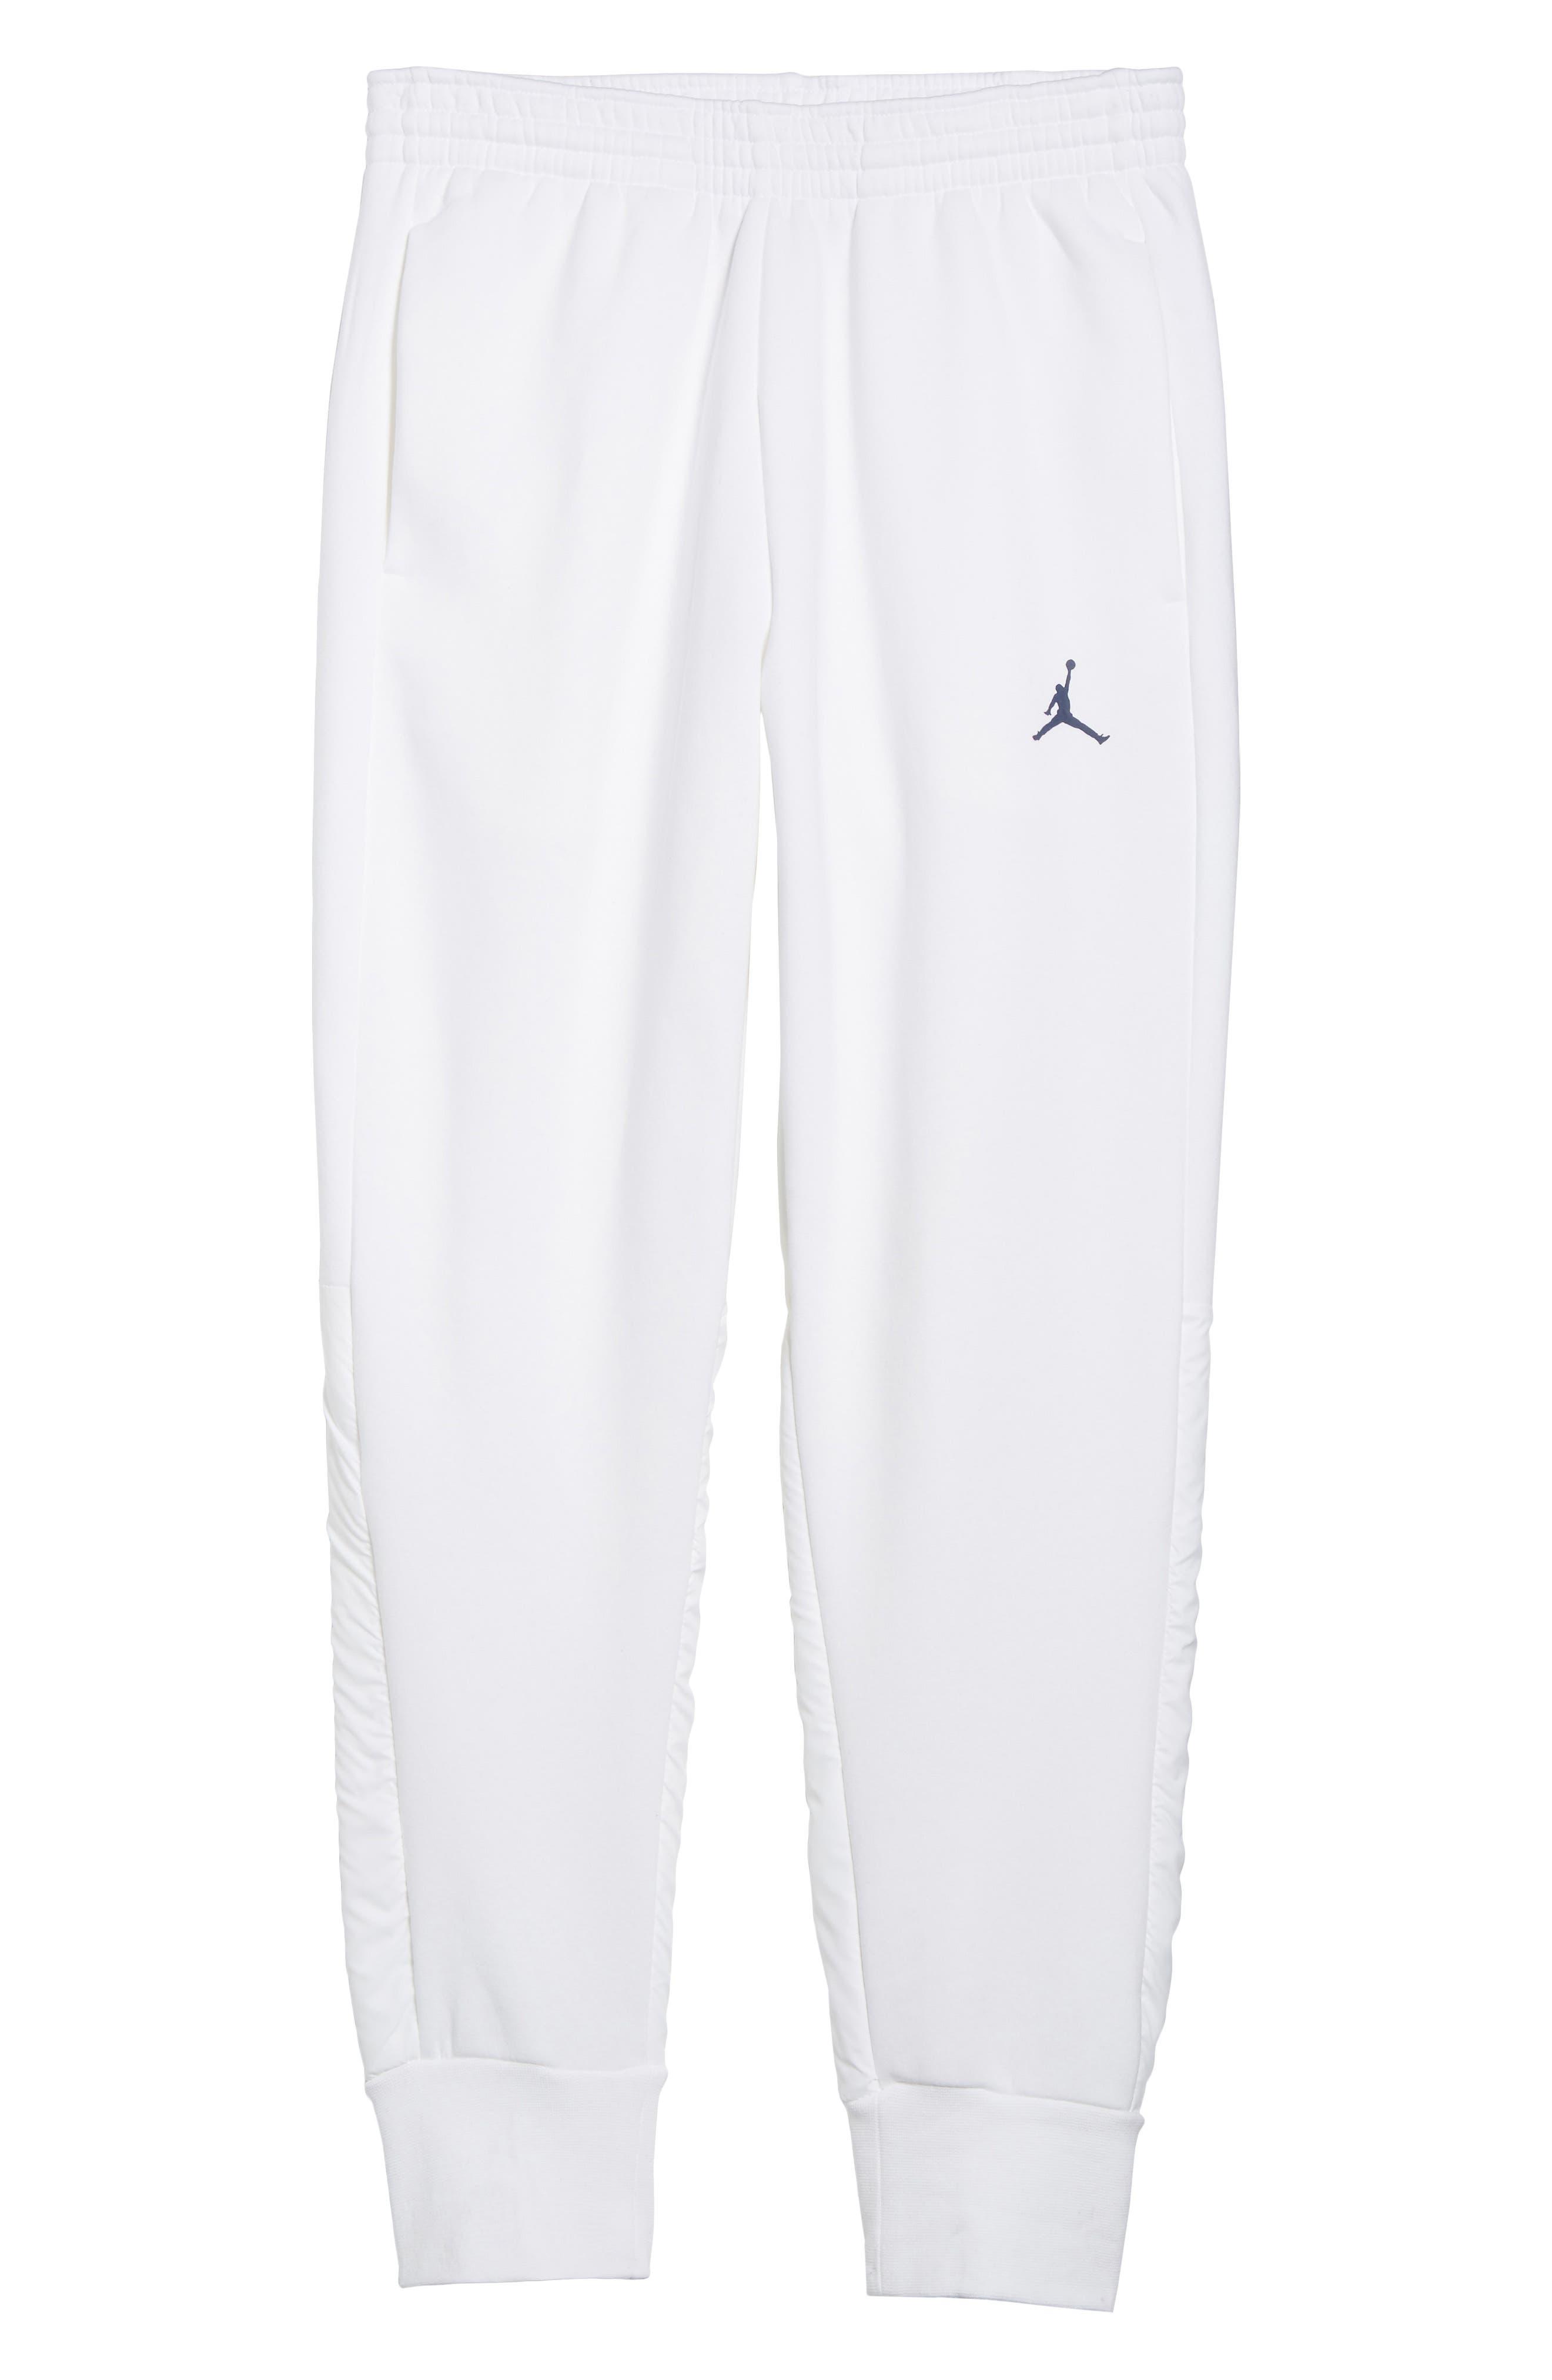 Jordan AJ11 Hybrid Pants,                             Alternate thumbnail 6, color,                             White